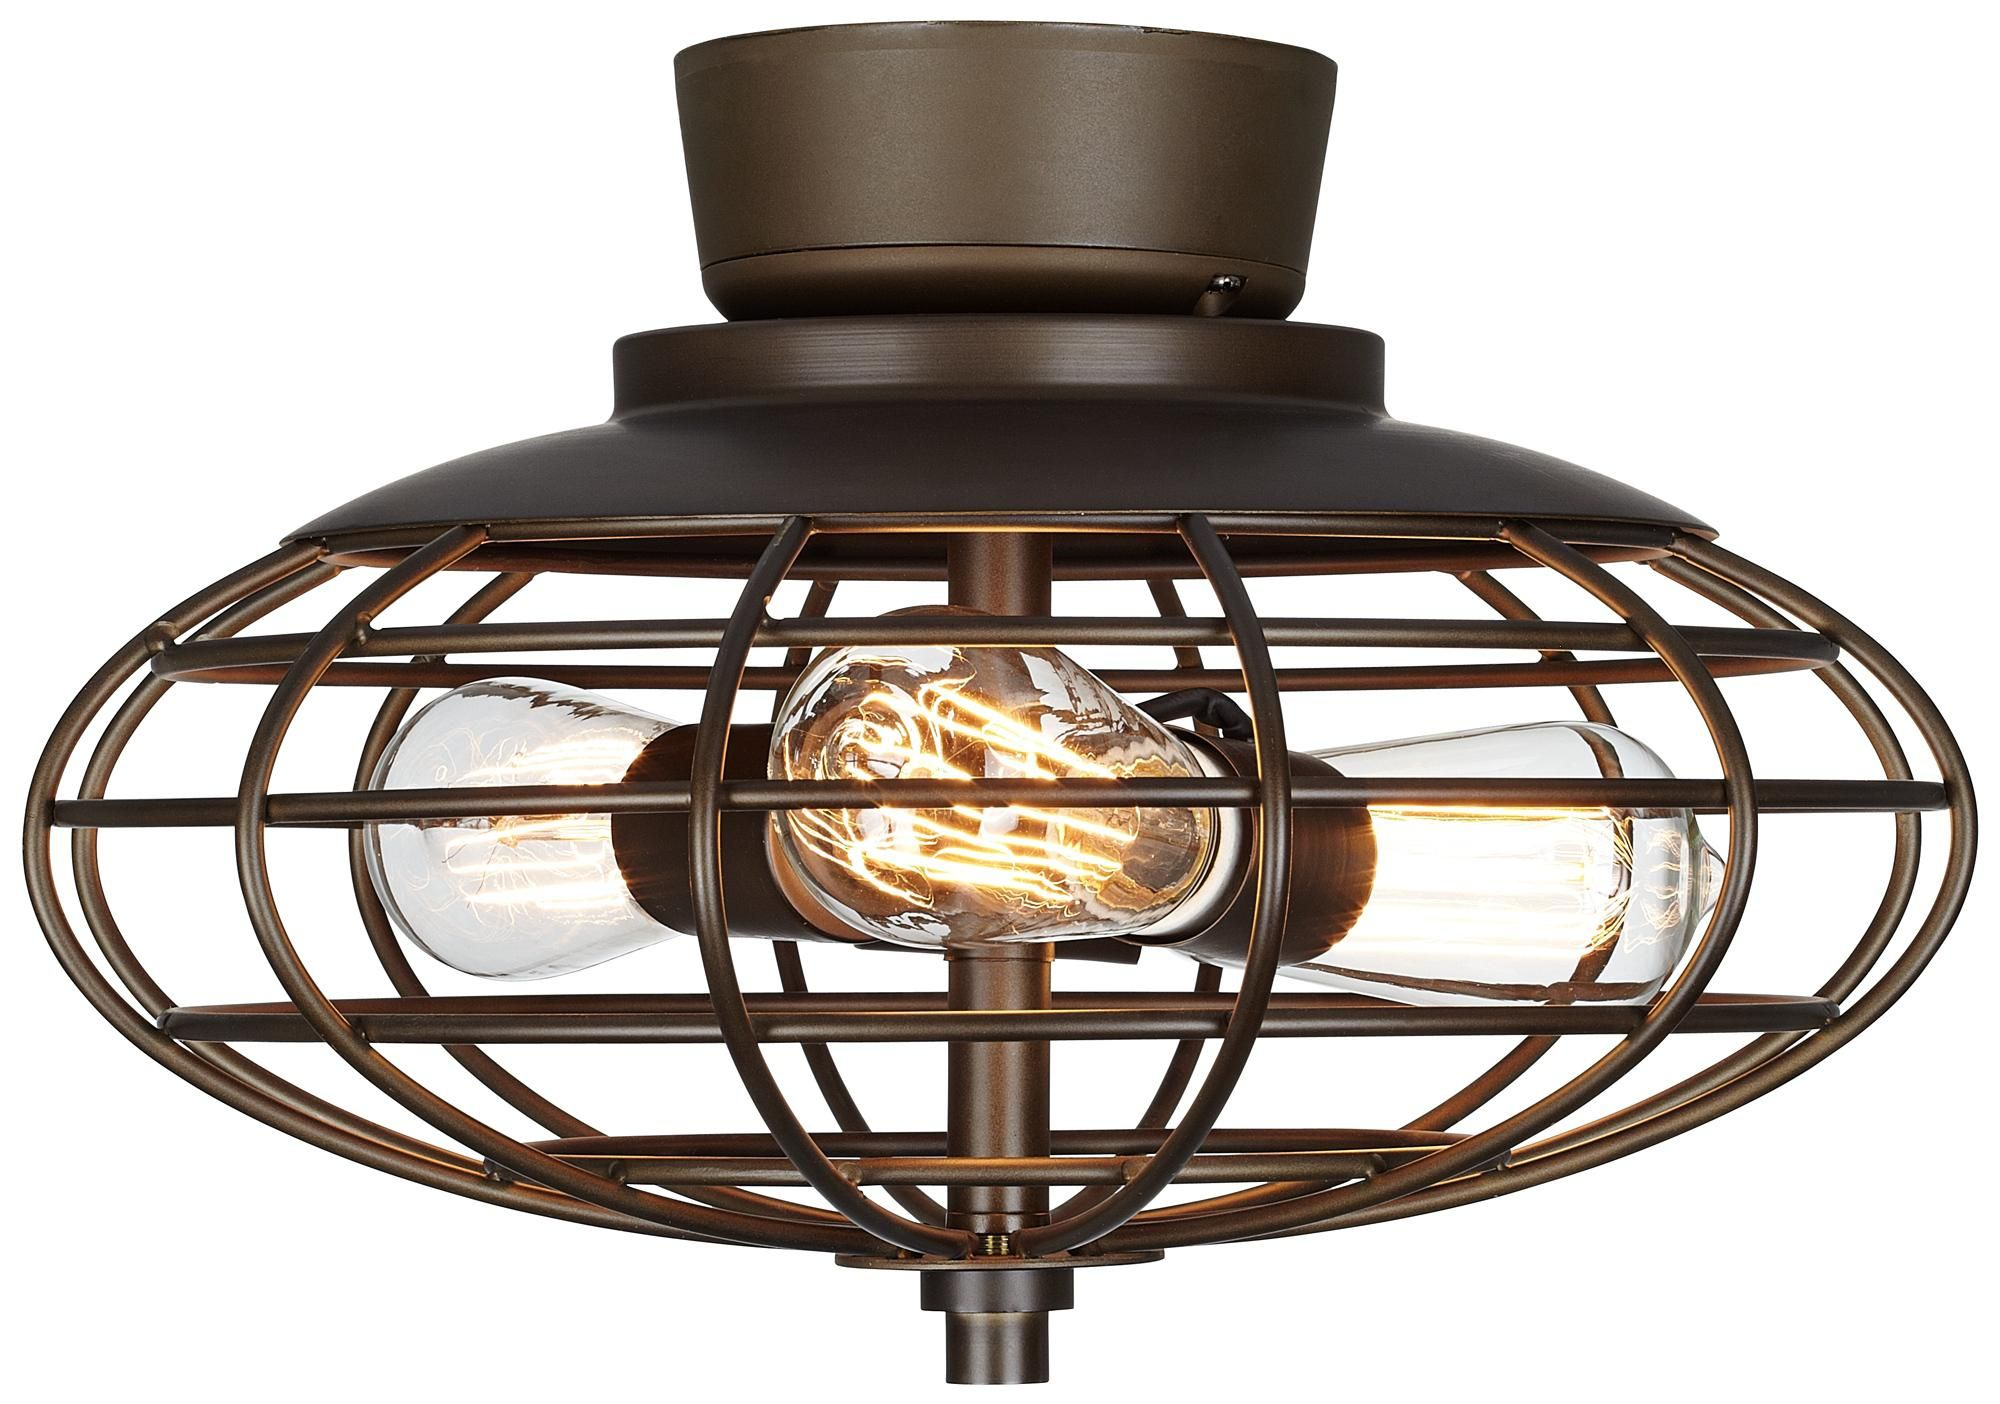 Hampton Bay 3 Light Oil Rubbed Bronze Vanity Light With: Oil Rubbed Bronze Industrial Cage 3-60 Watt Ceiling Fan